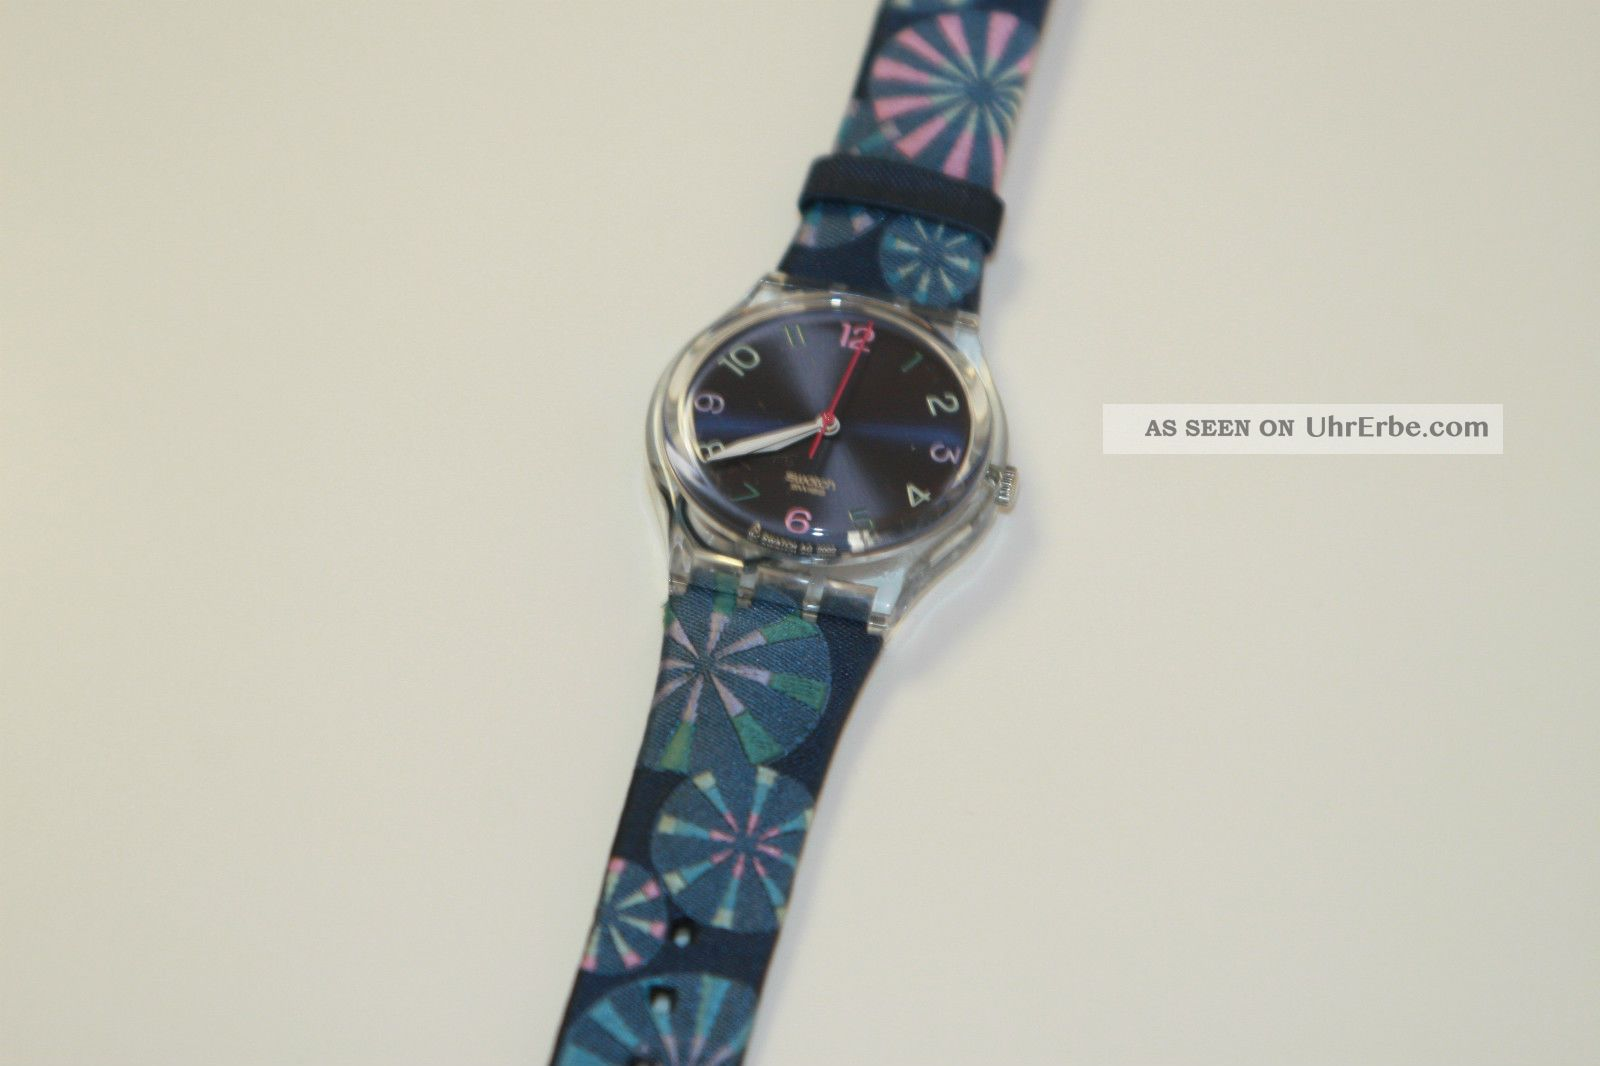 Swatch Armbanduhr Design Armbanduhren Bild